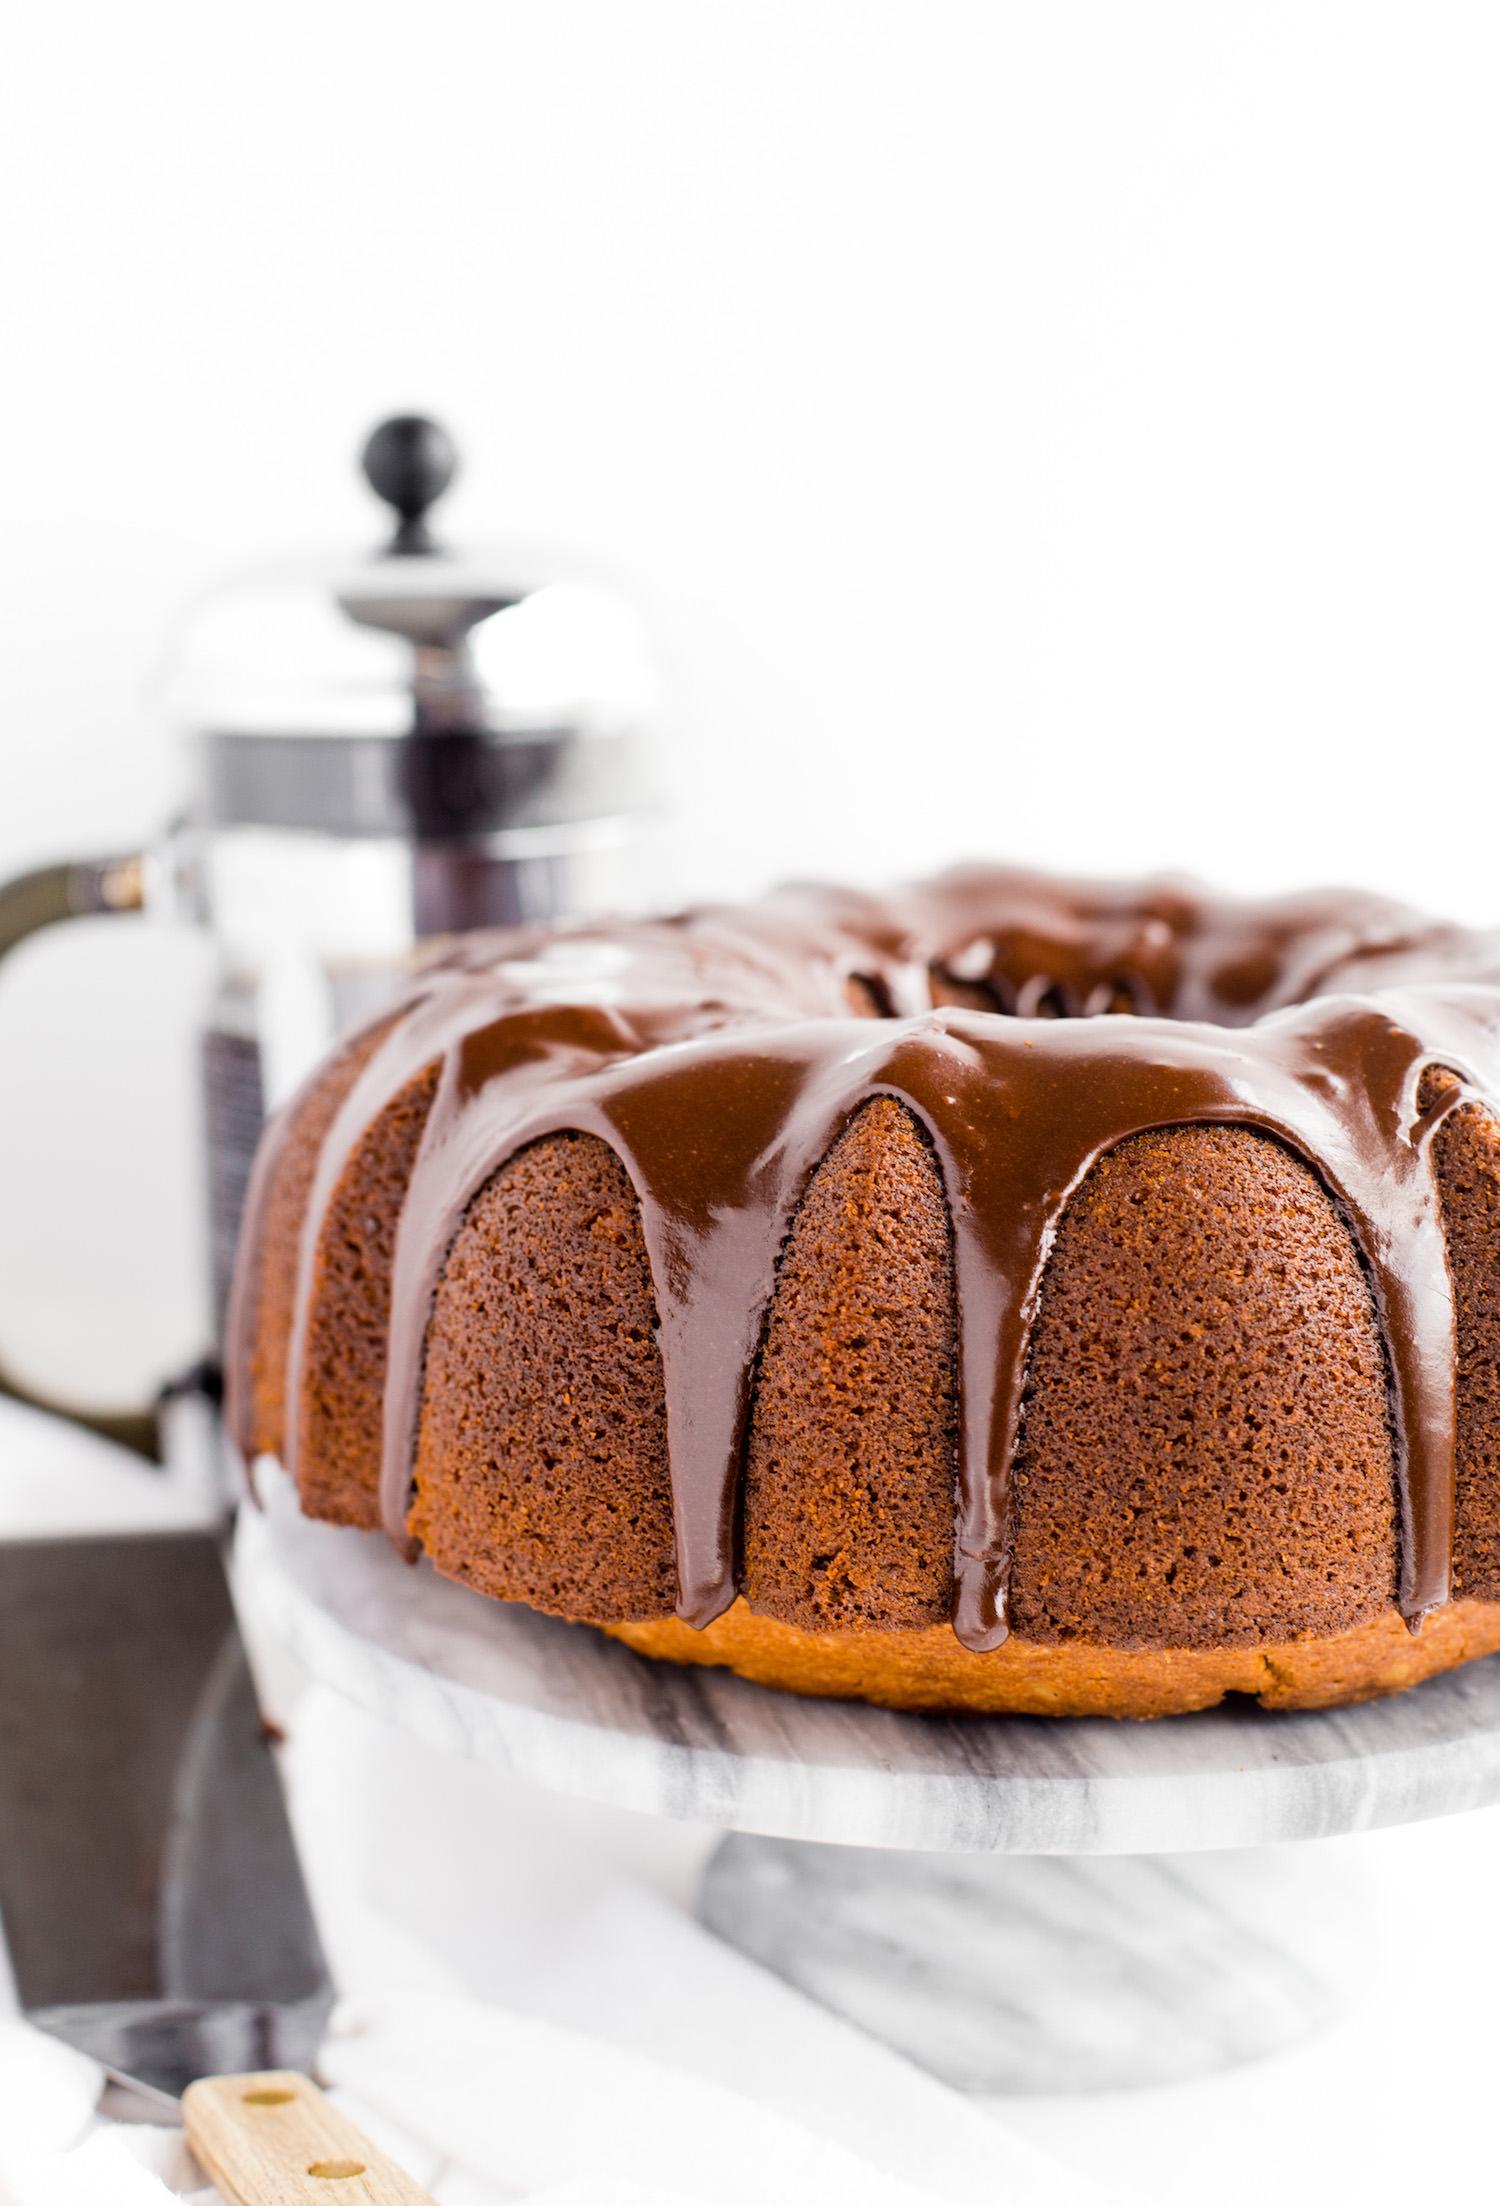 Vanilla Bundt Cake with Gooey Chocolate Center: soft, tender, fluffy yet hefty vanilla cake with a gooey, rich, oozing chocolate center. Dairy-free!   TrufflesandTrends.com